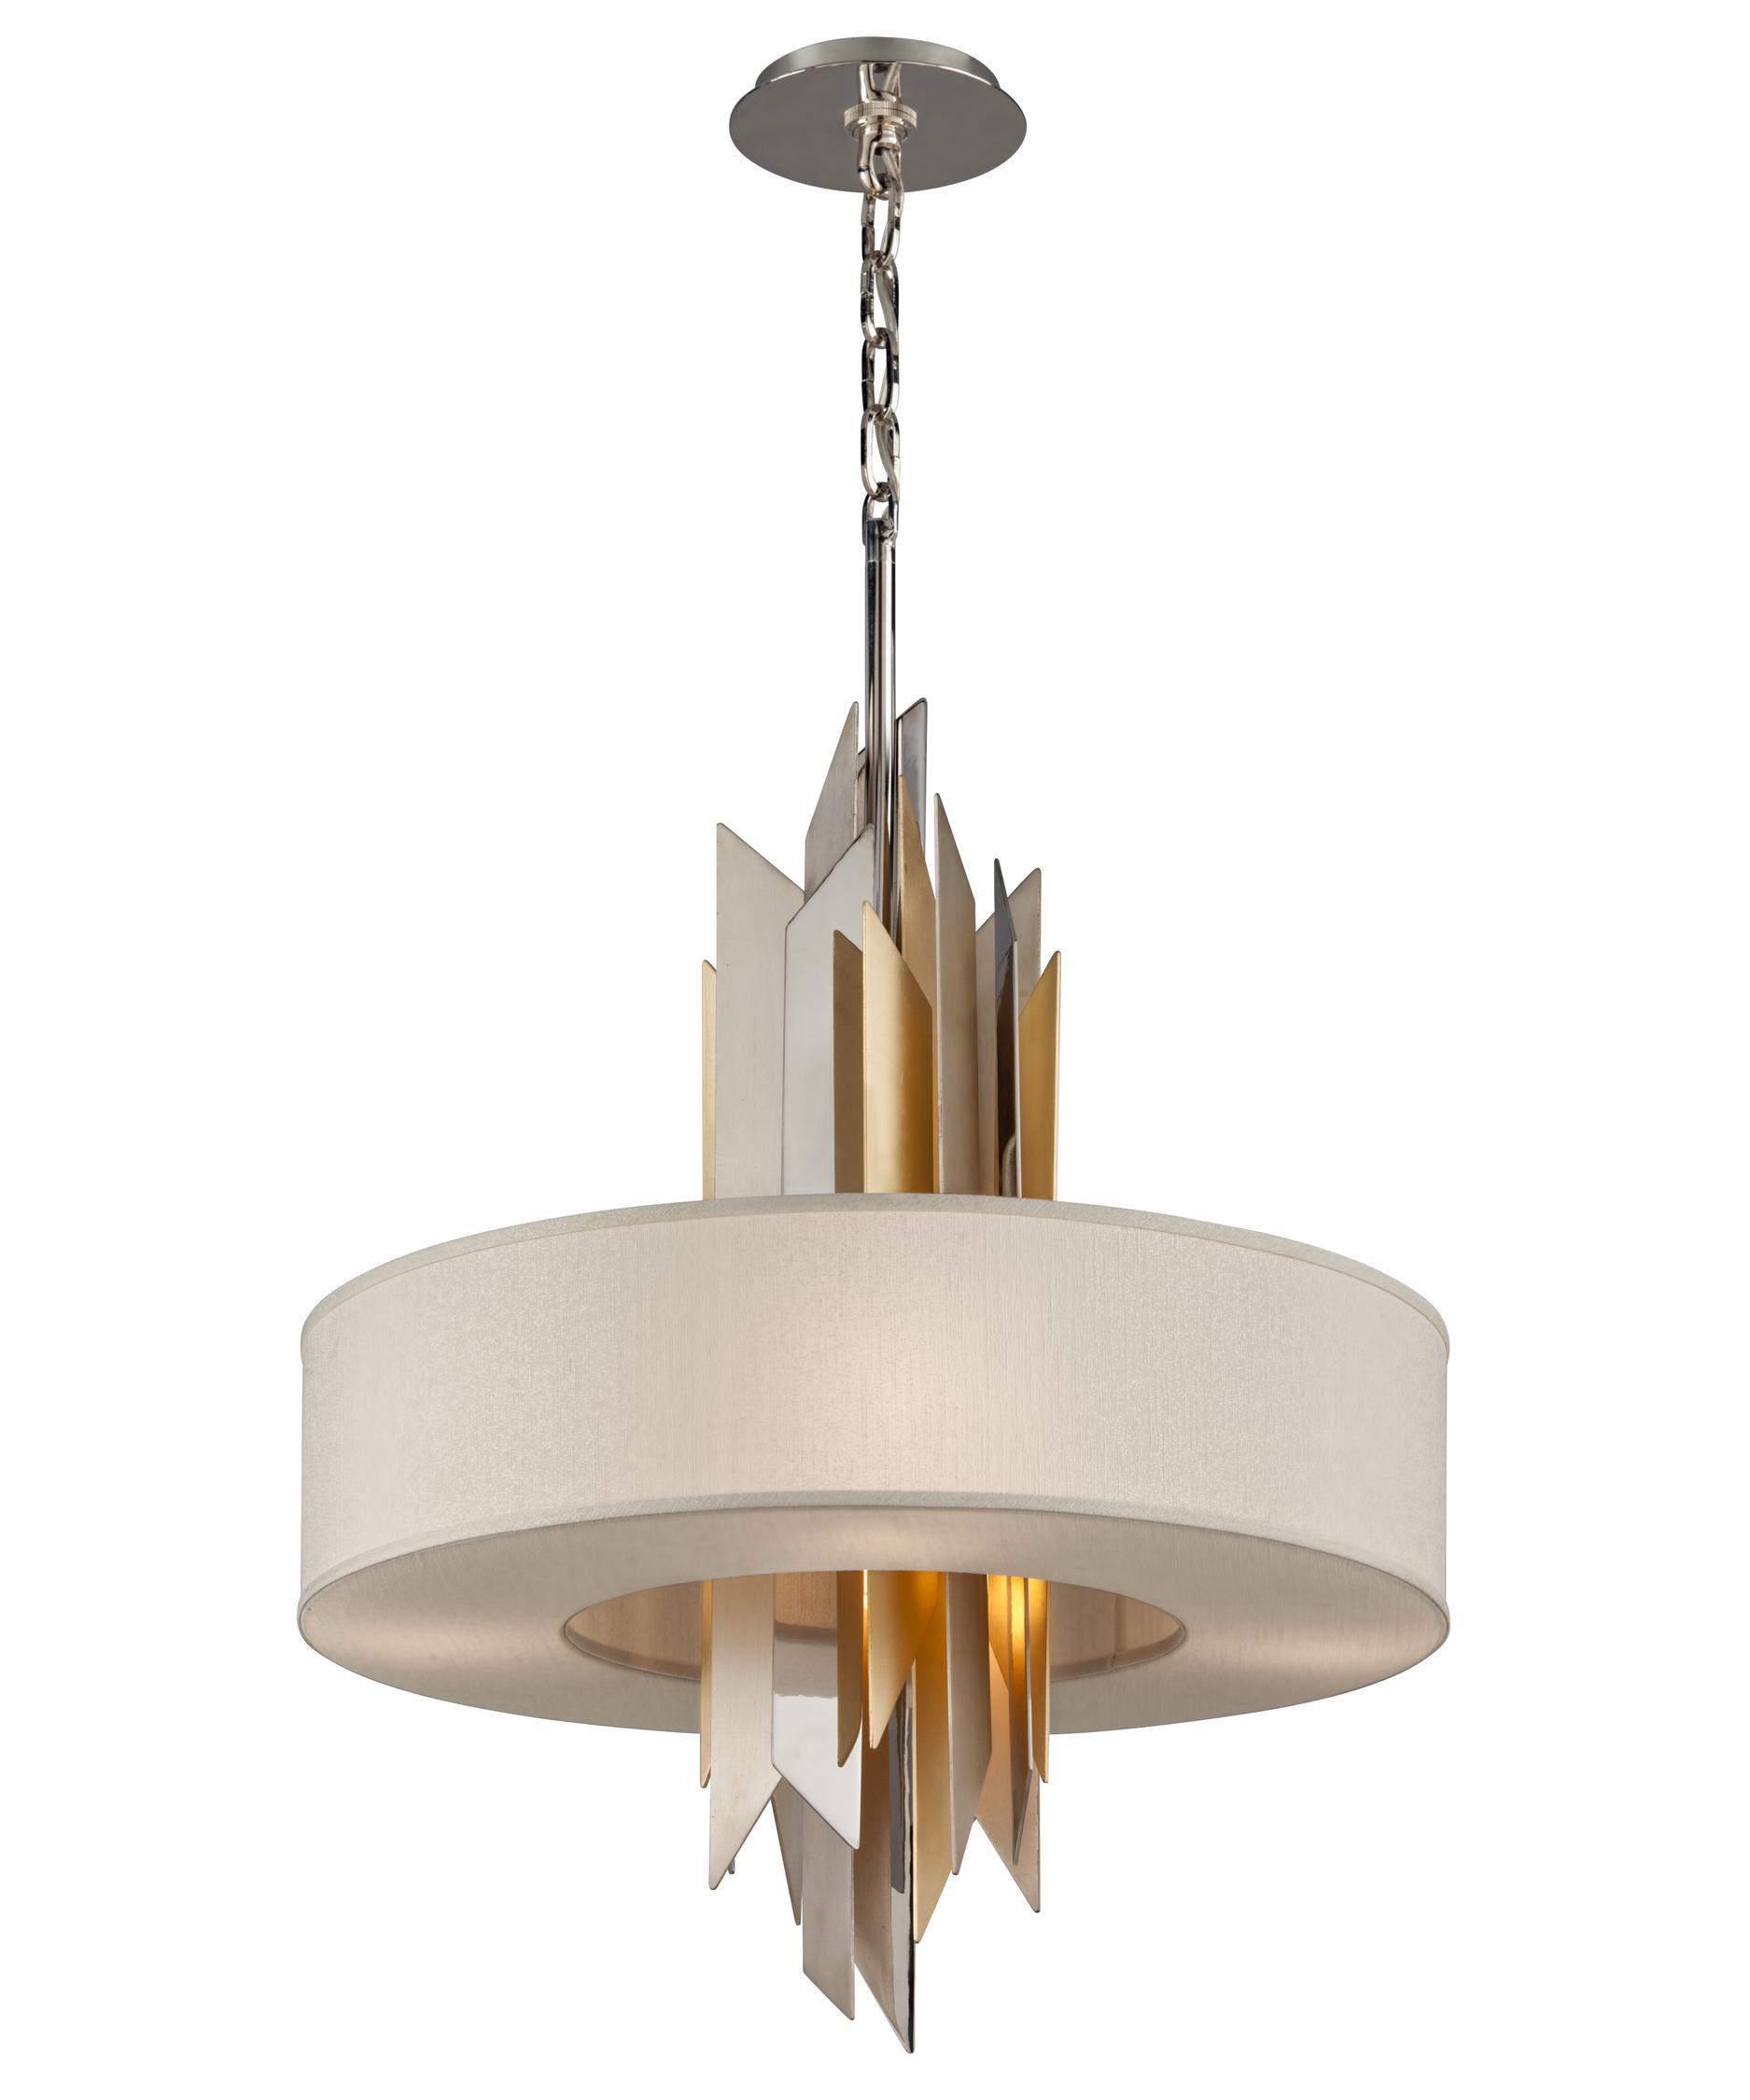 mid century modern lighting fixtures. corbett lighting modernist pendant mid century modern fixtures l